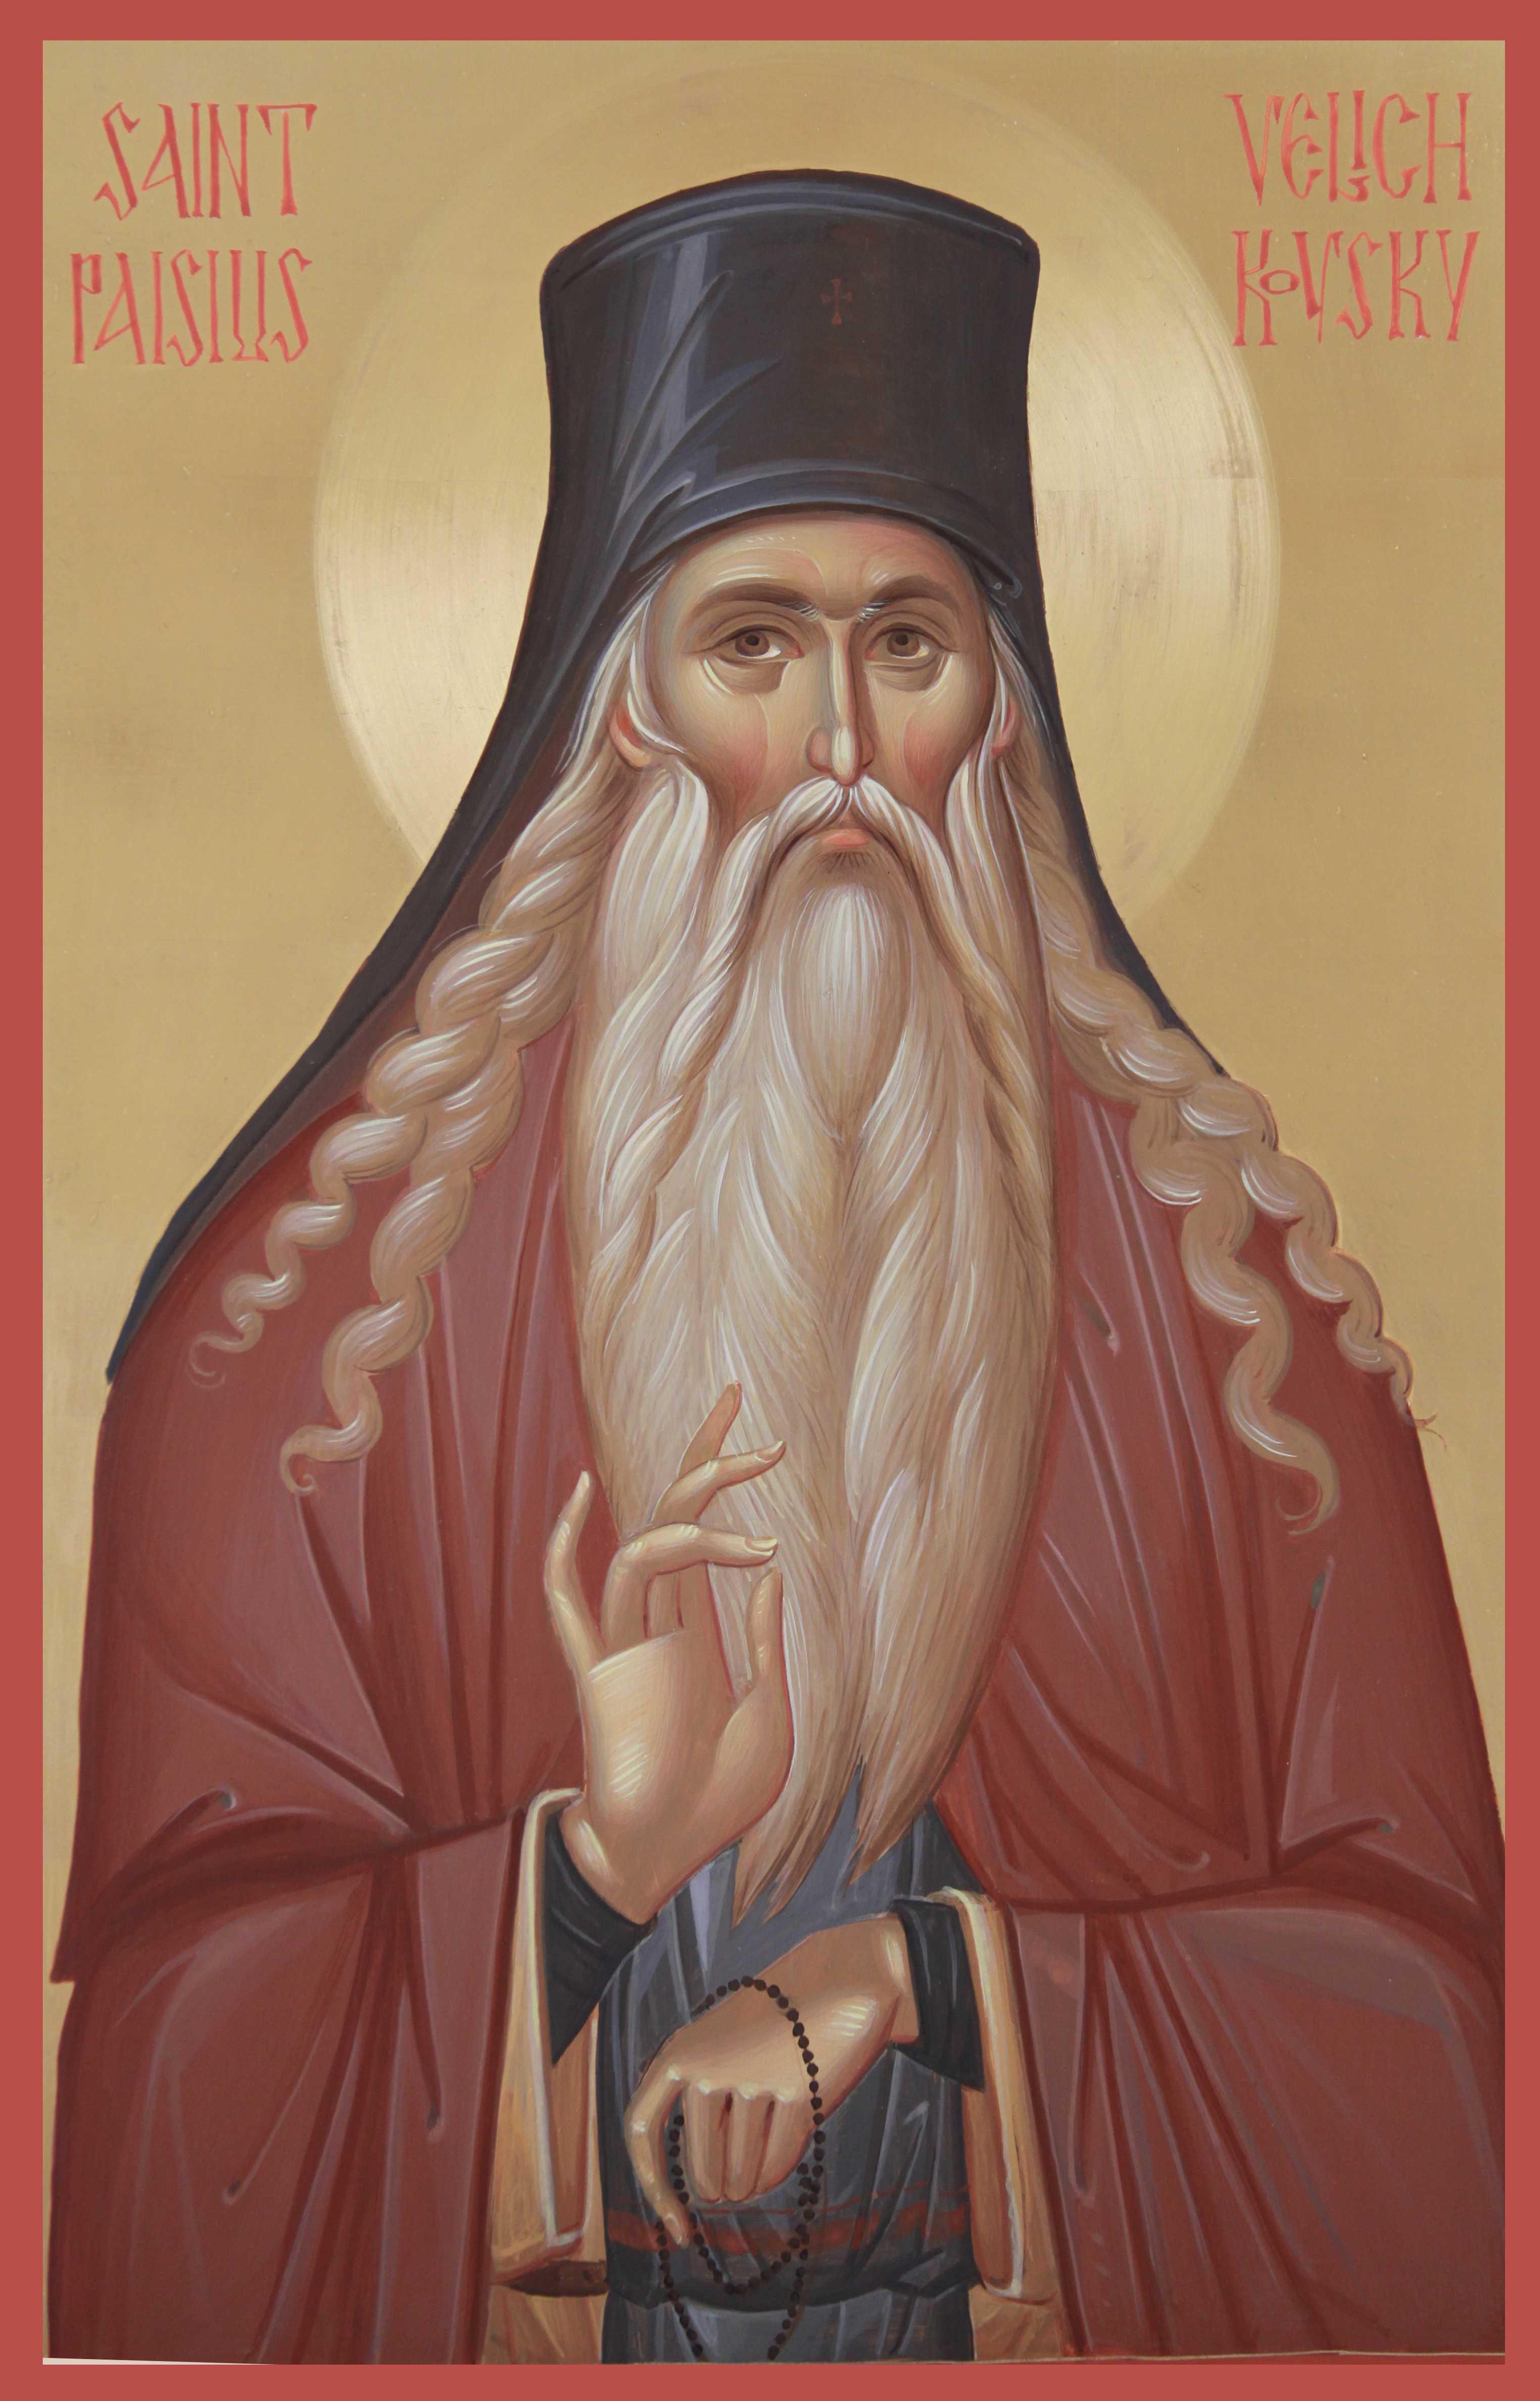 SFANTUL PAISIE DE LA NEAMT despre necesitatea <i>citirii Sfintilor Parinti</i> si a <i>sfatuirii fratesti</i>, in vremurile lipsei de <i>stareti</i> duhovnicesti